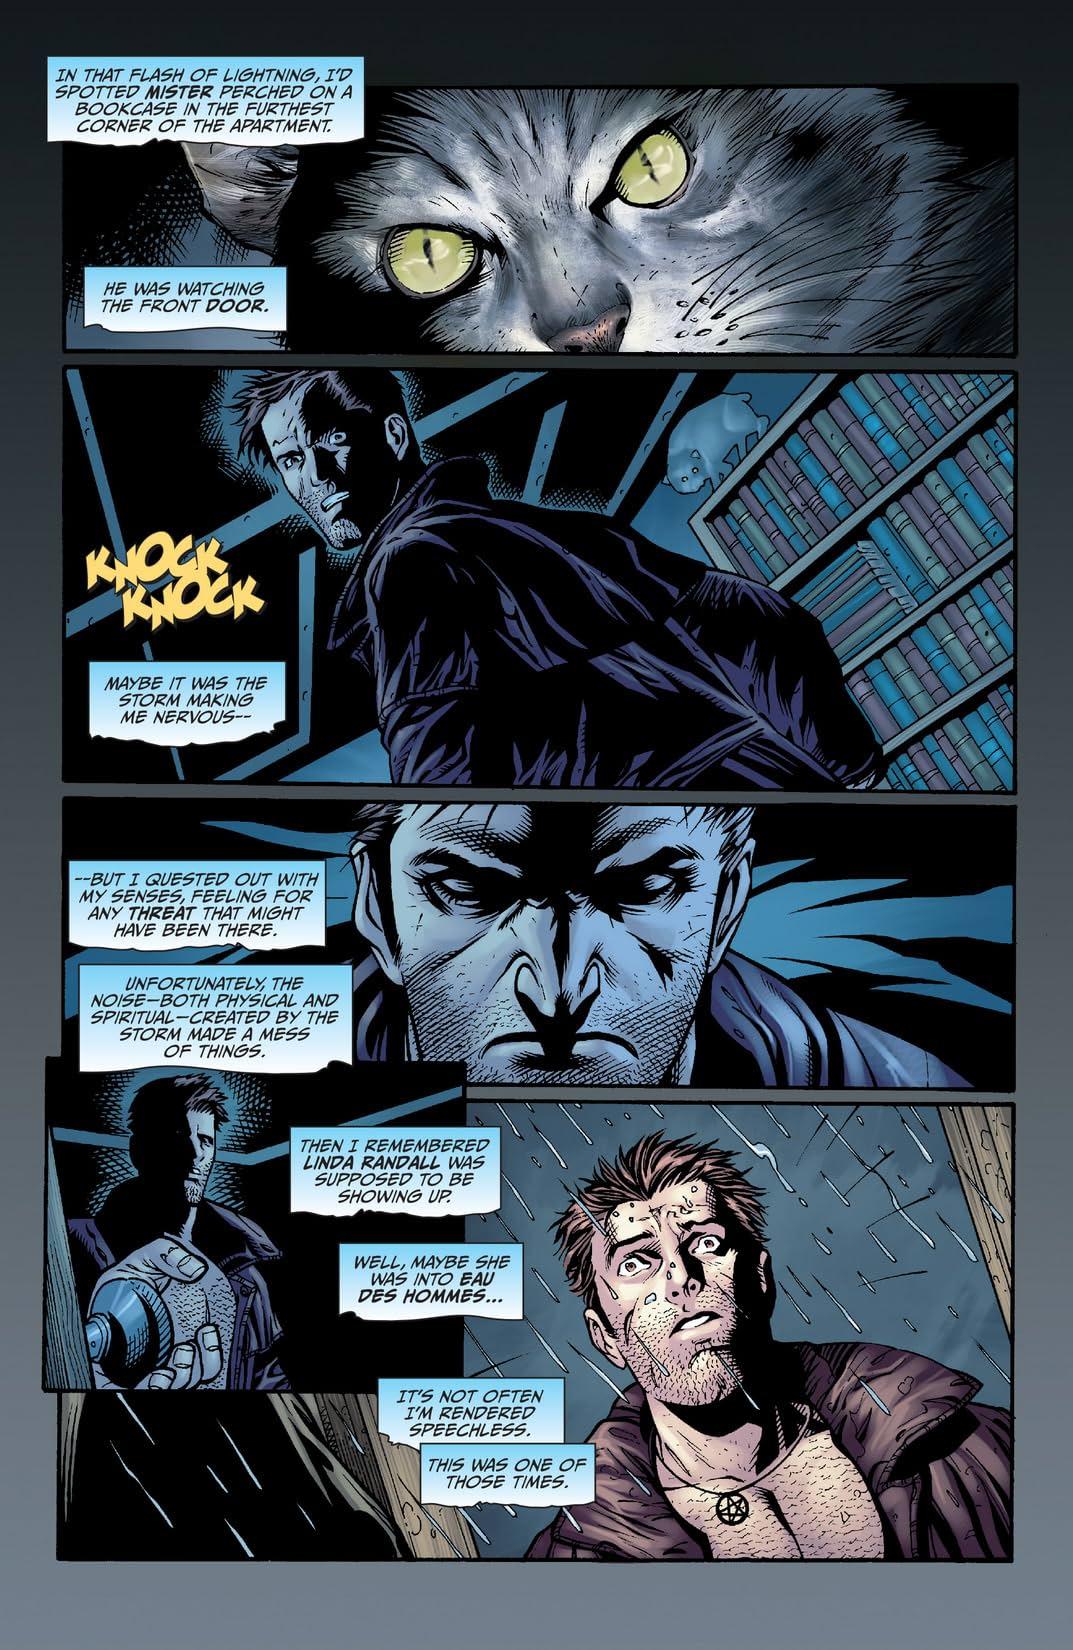 Jim Butcher's The Dresden Files: Storm Front #4